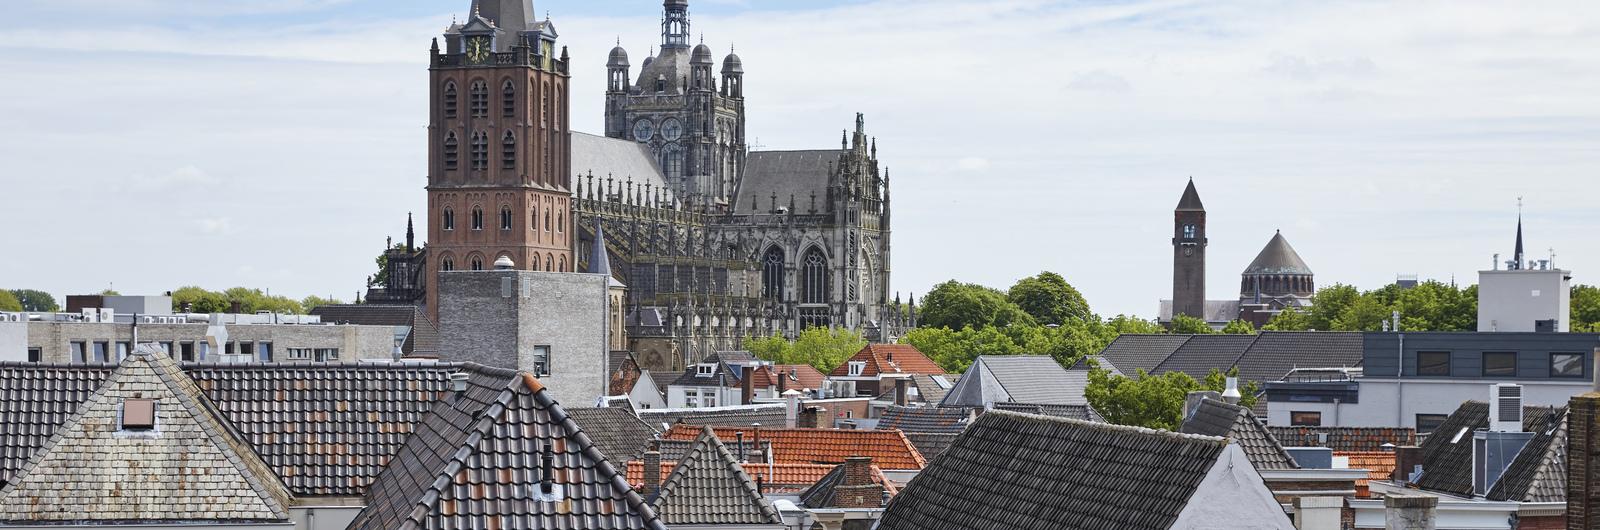 s hertogenbosch city header